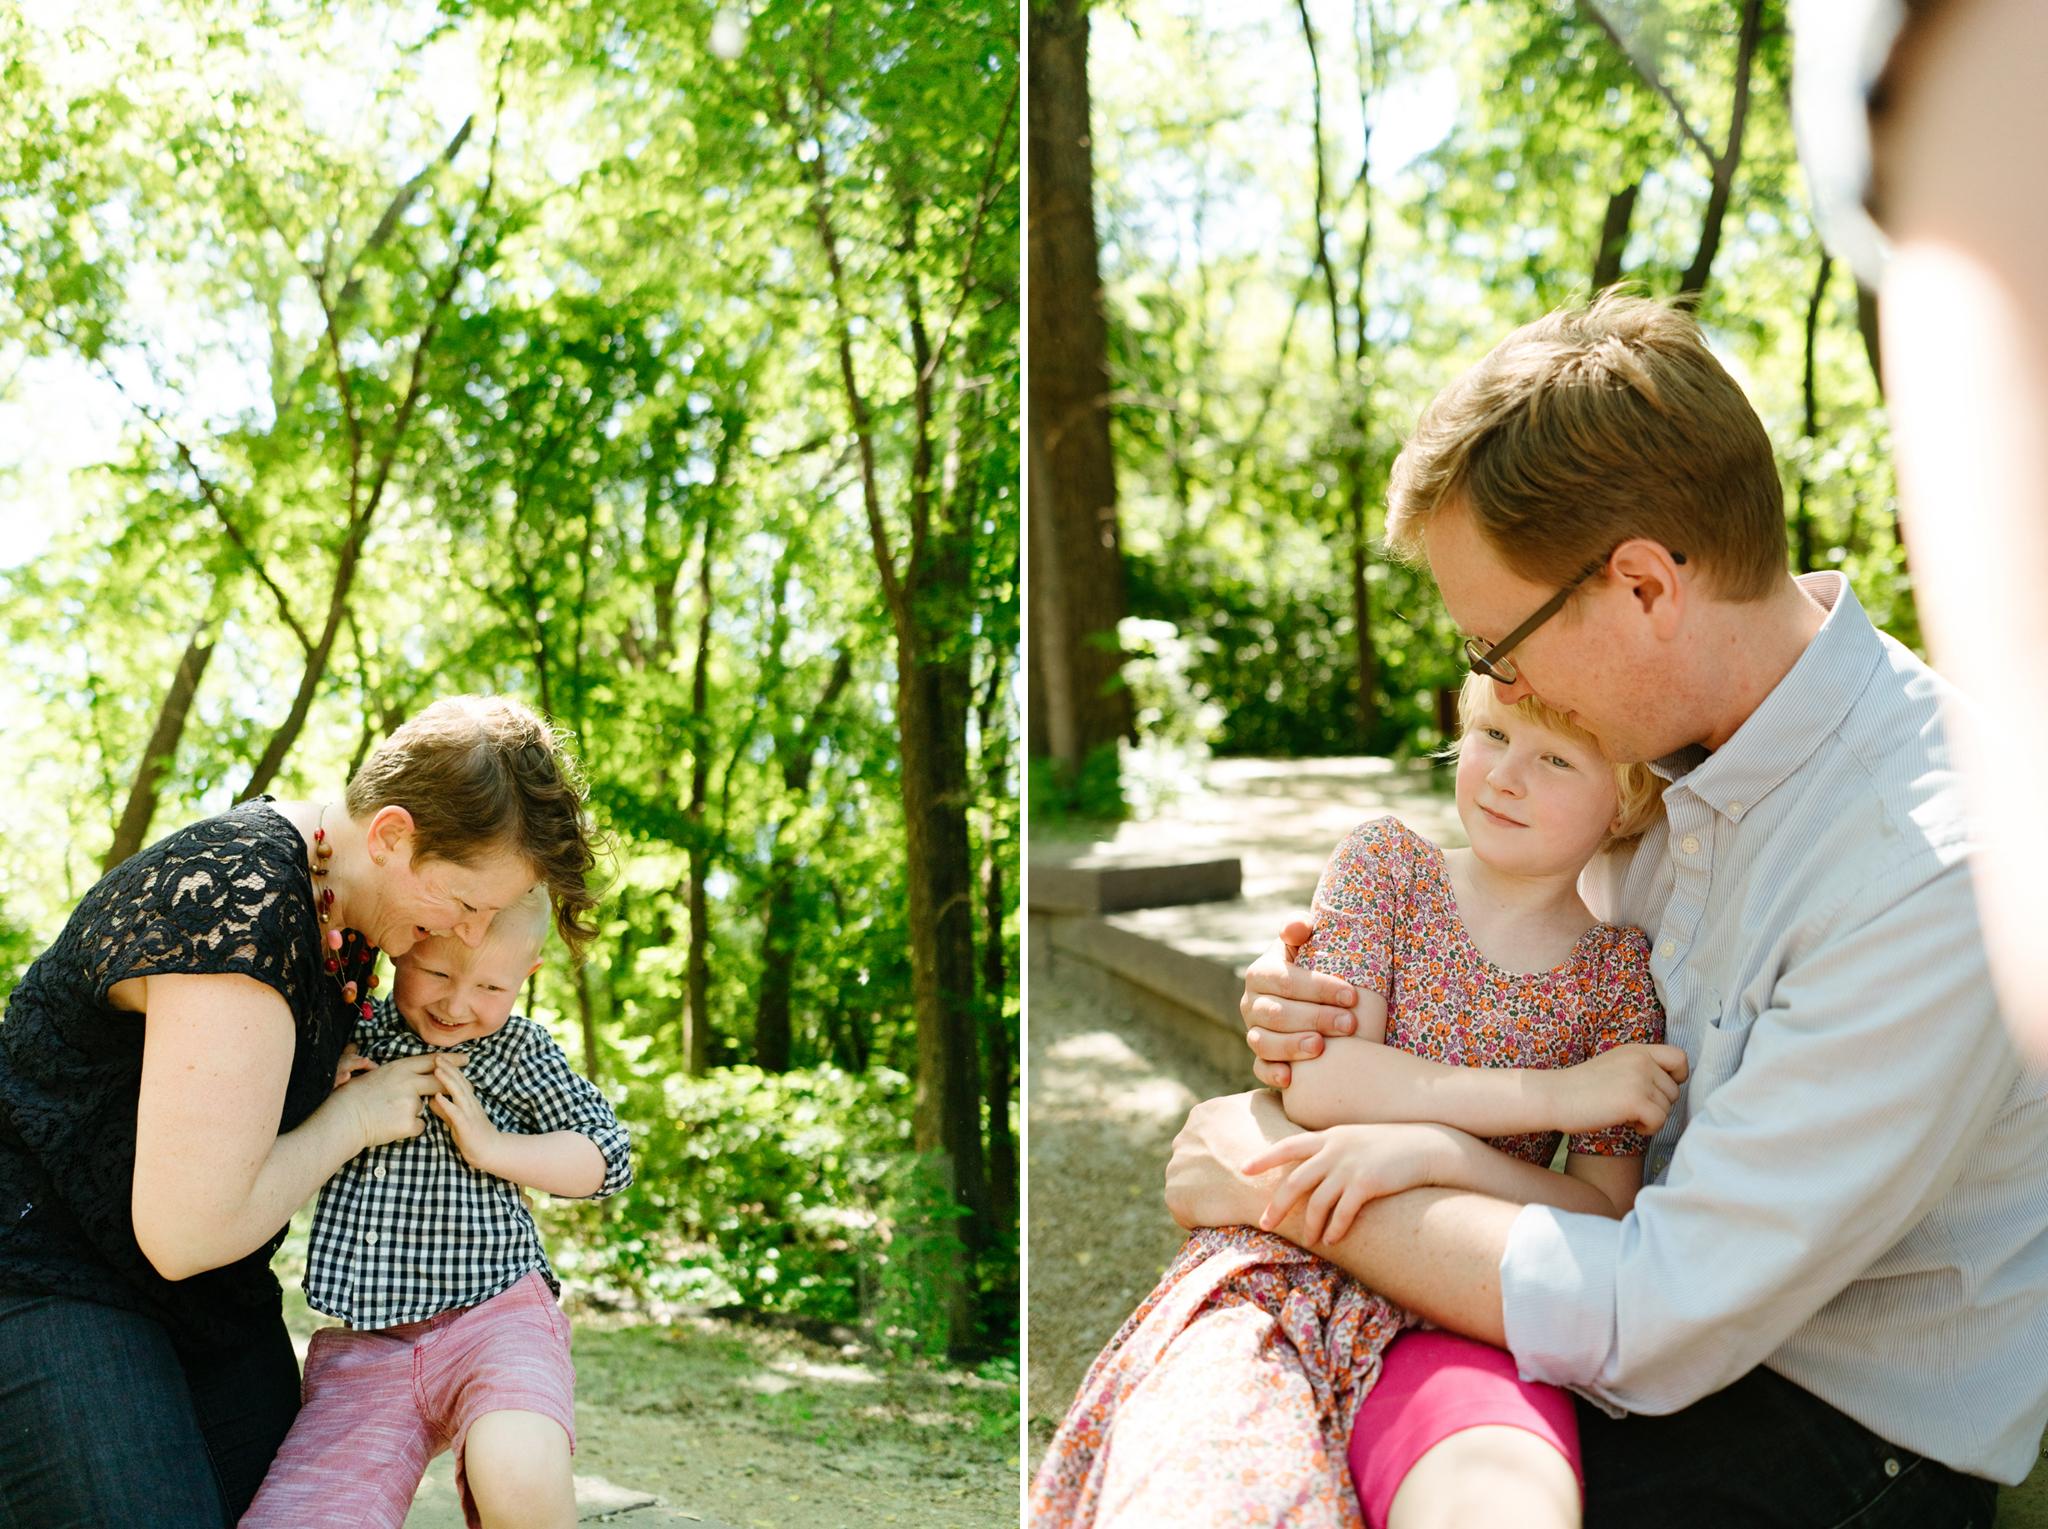 Tacoma Family Photography at Point Defiance